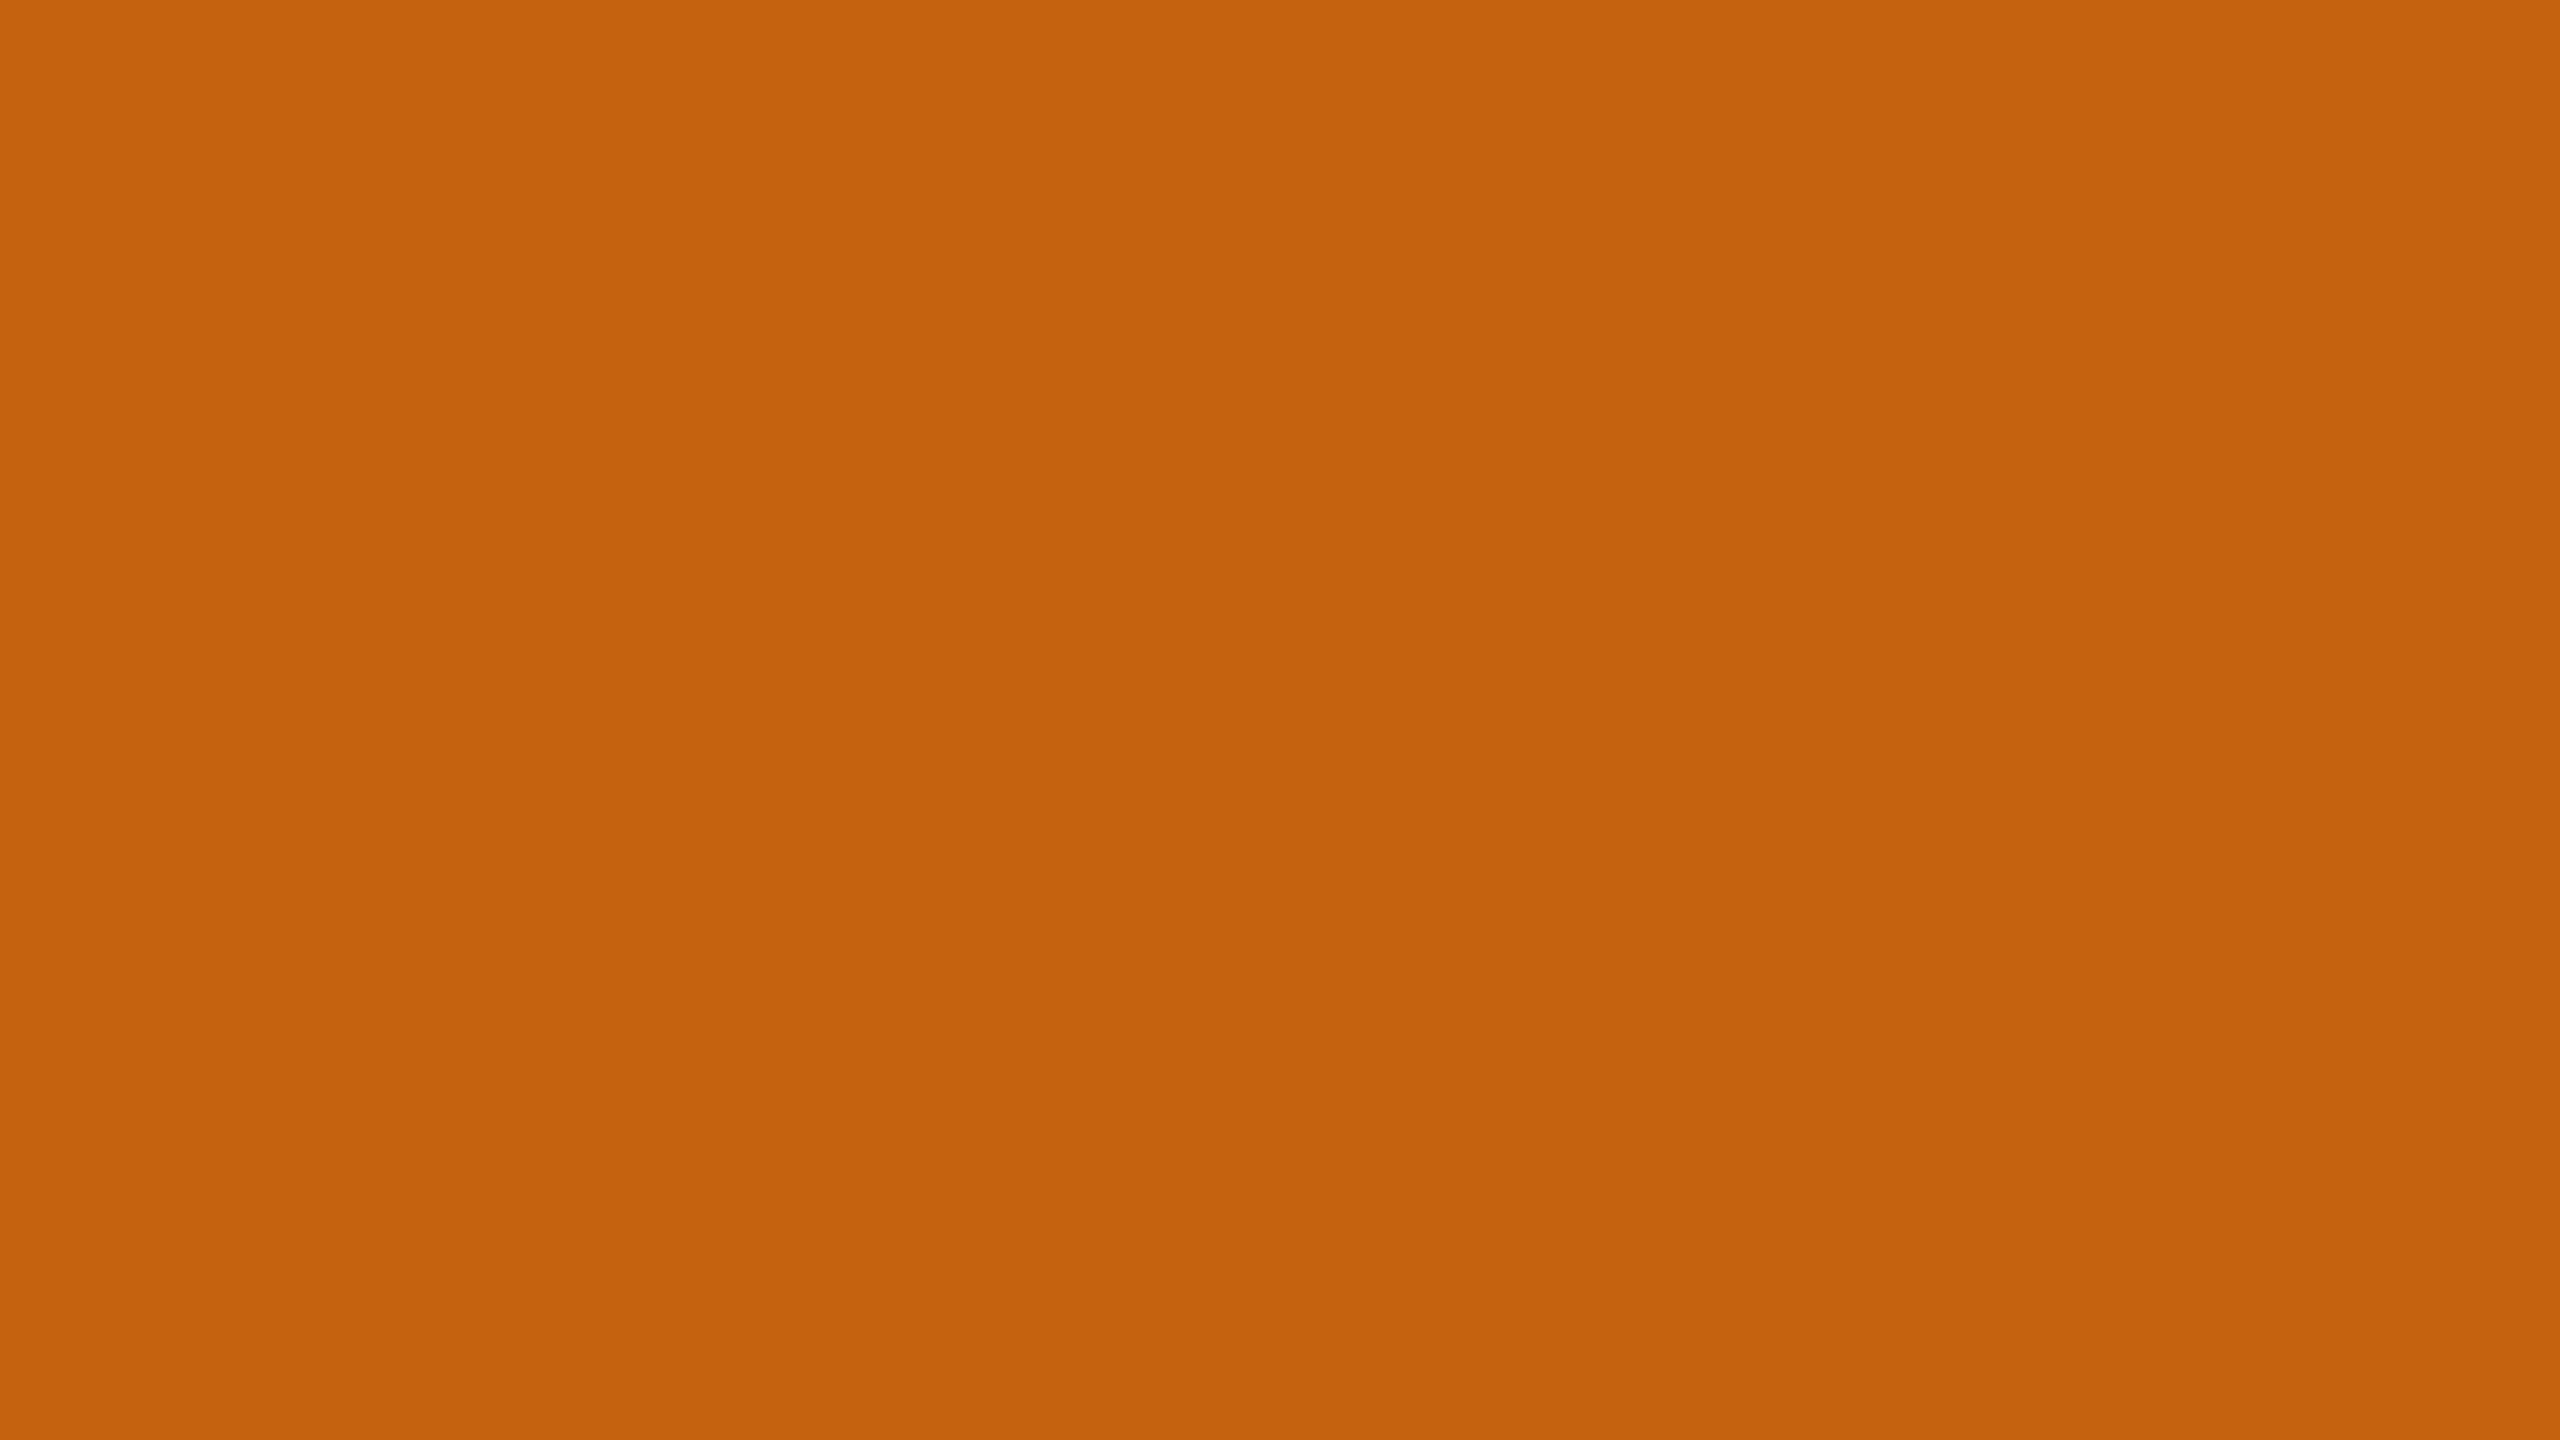 2560x1440 Alloy Orange Solid Color Background